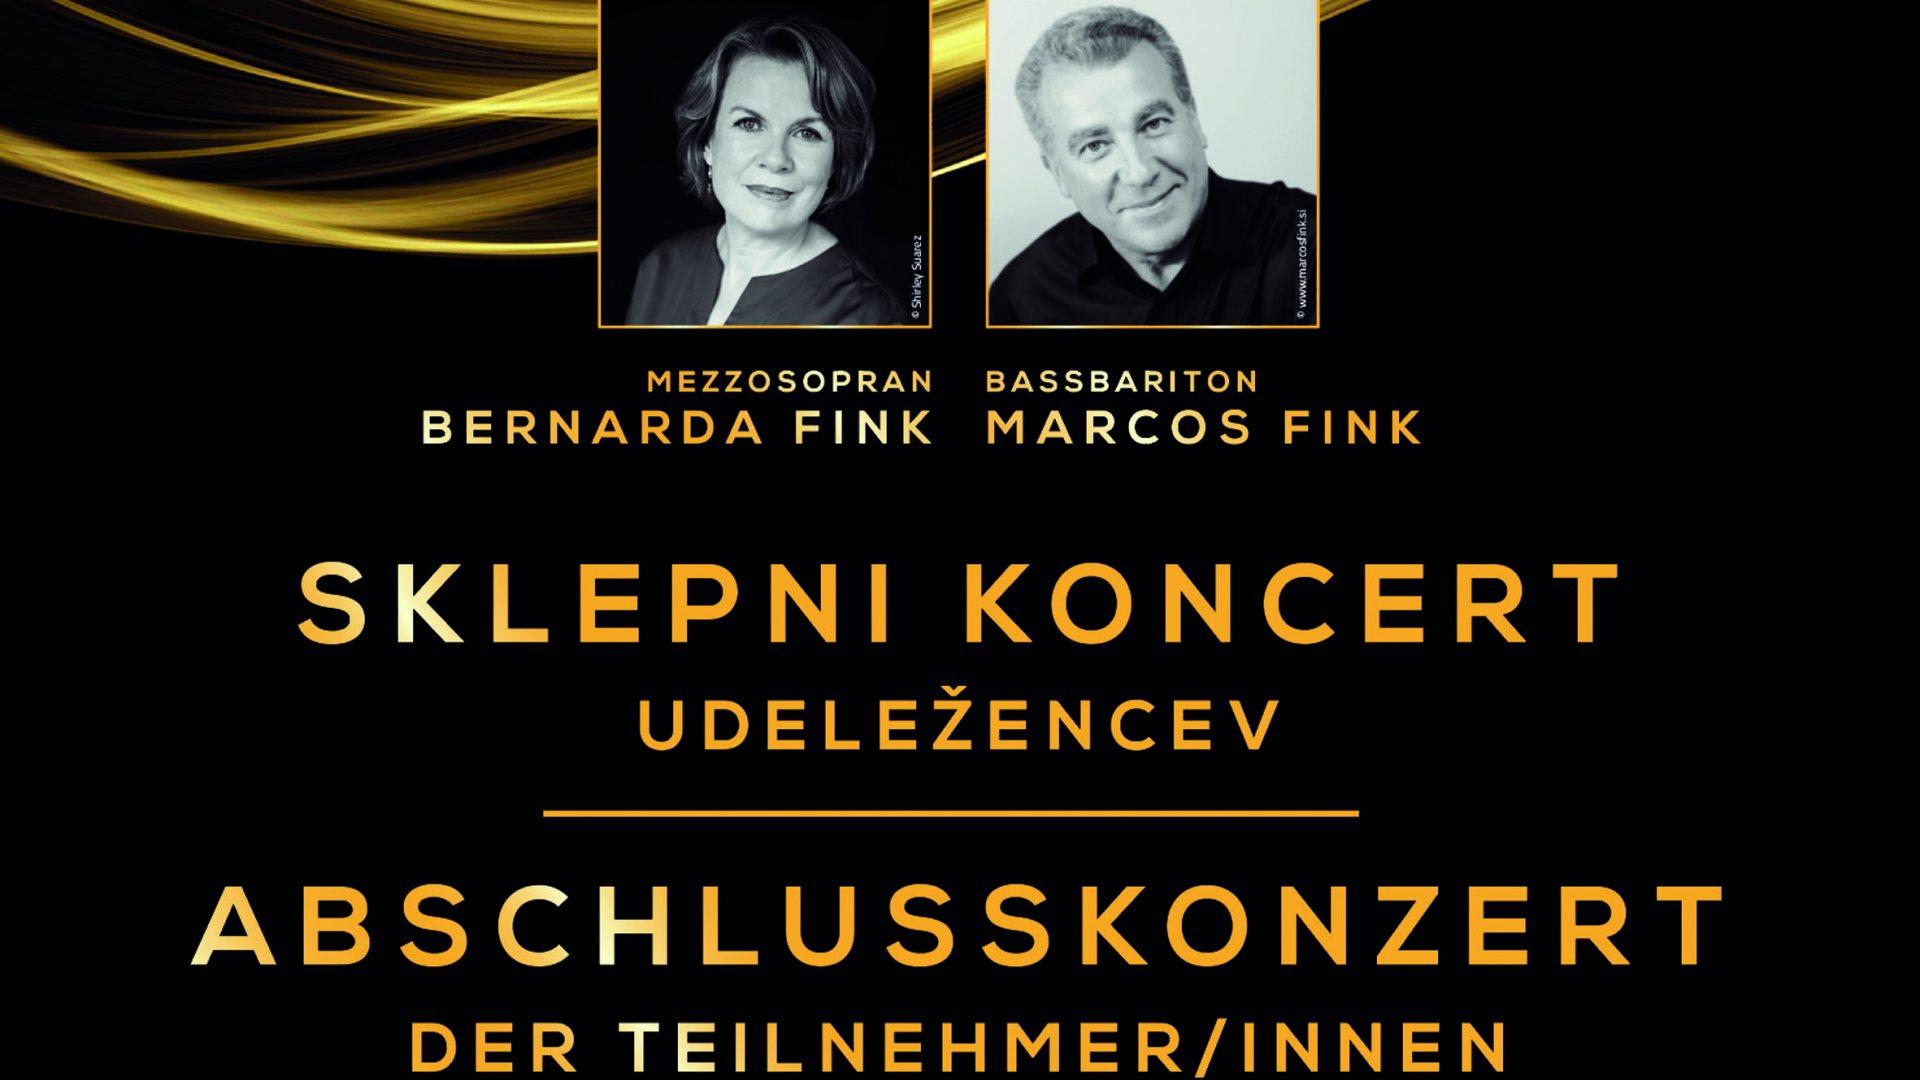 Mojstrski tečaj petja / Meisterklasse Gesang - Abschlusskonzert / Sklepni koncert